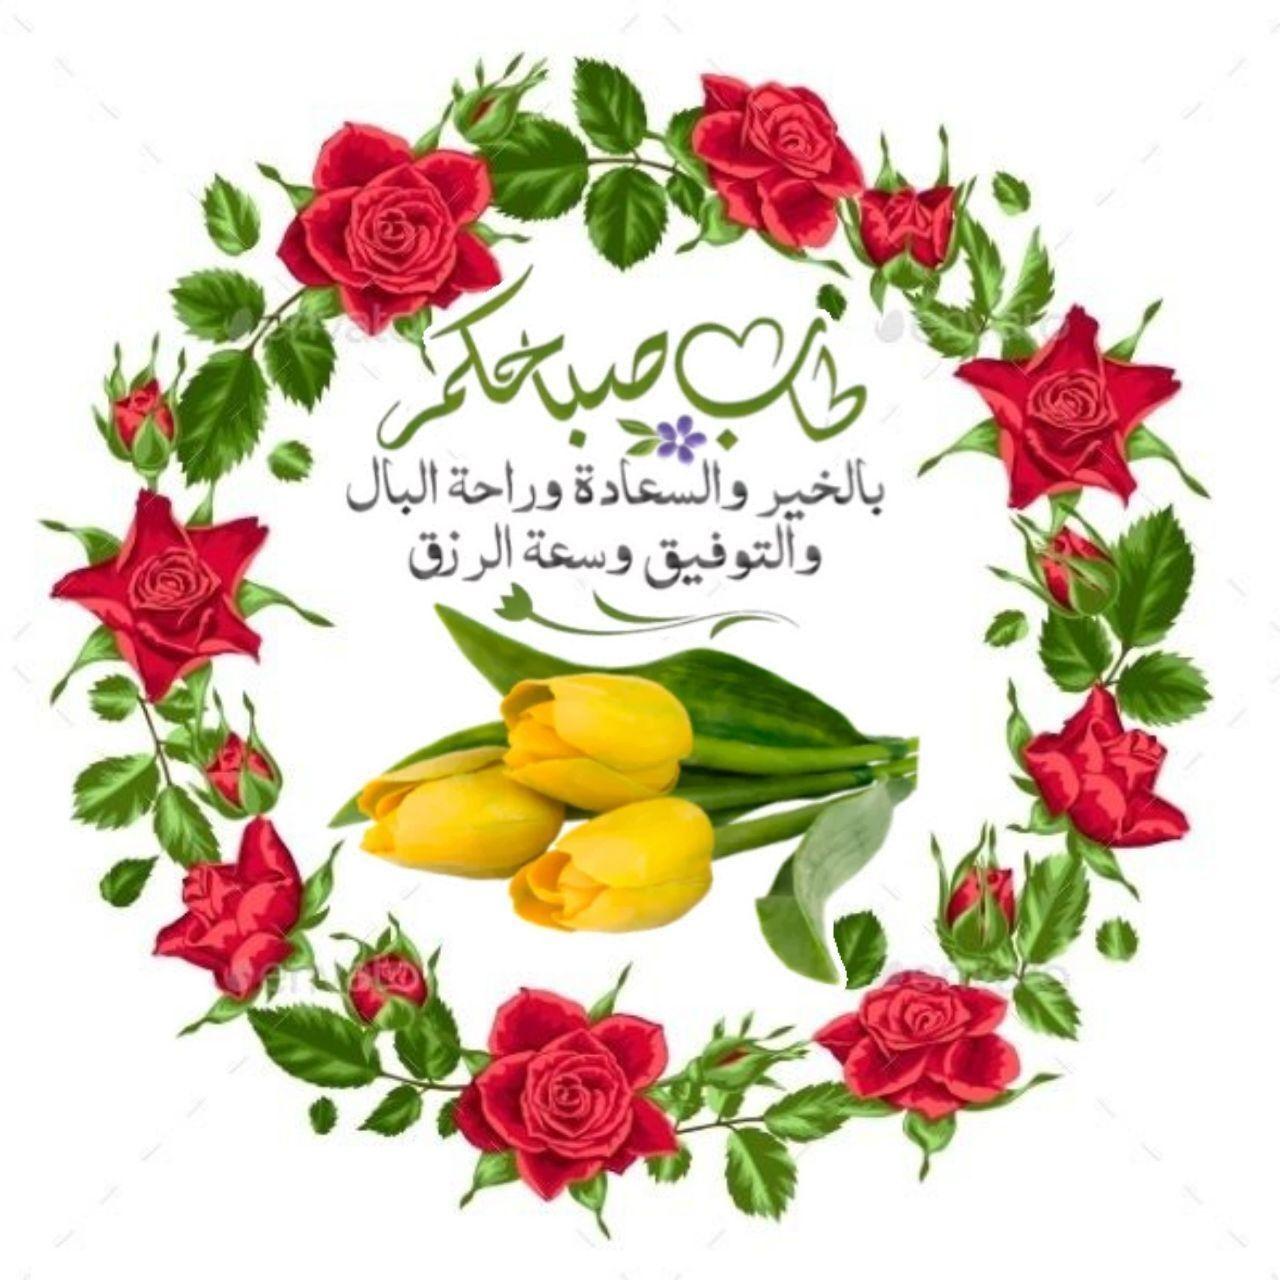 Pin By Rayhana On صباحيات Good Morning Arabic Beautiful Morning Words